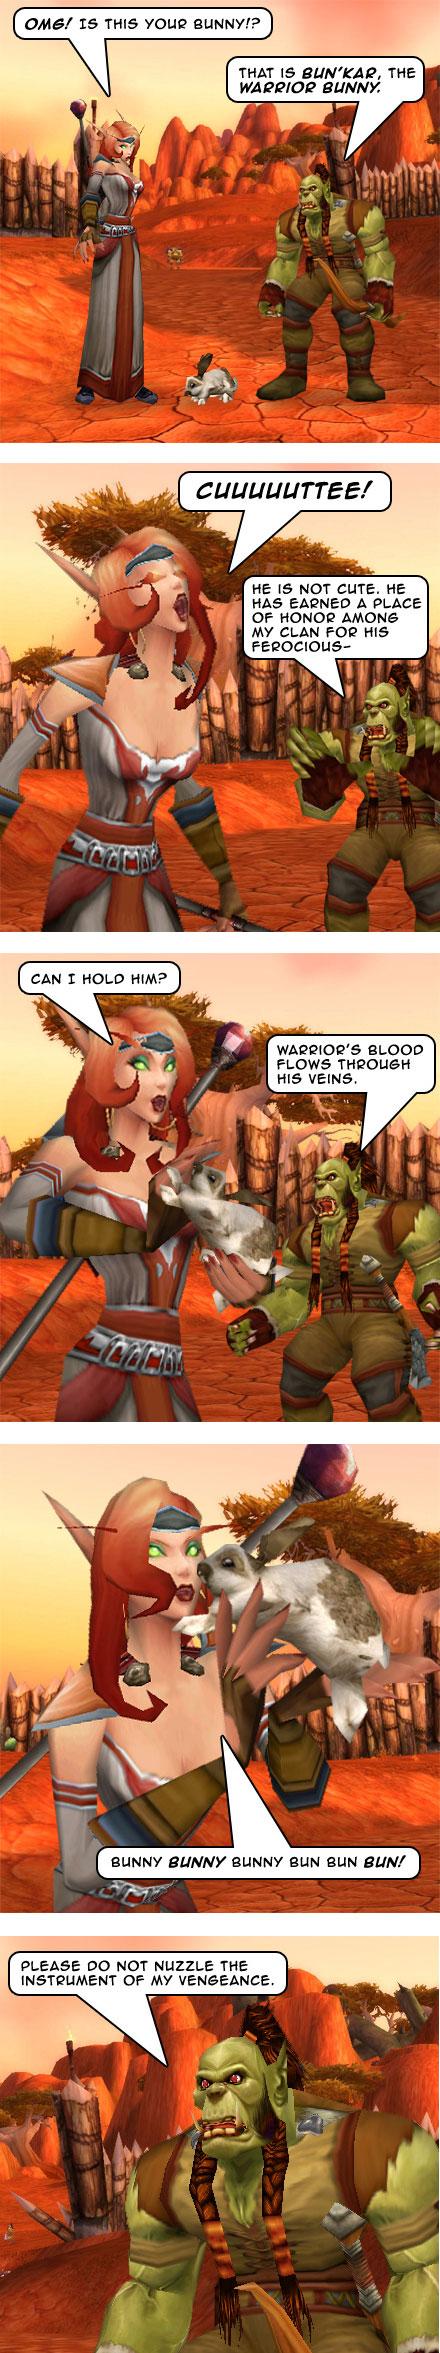 Part 4: Warlock, Bunny. Bunny, Warlock.